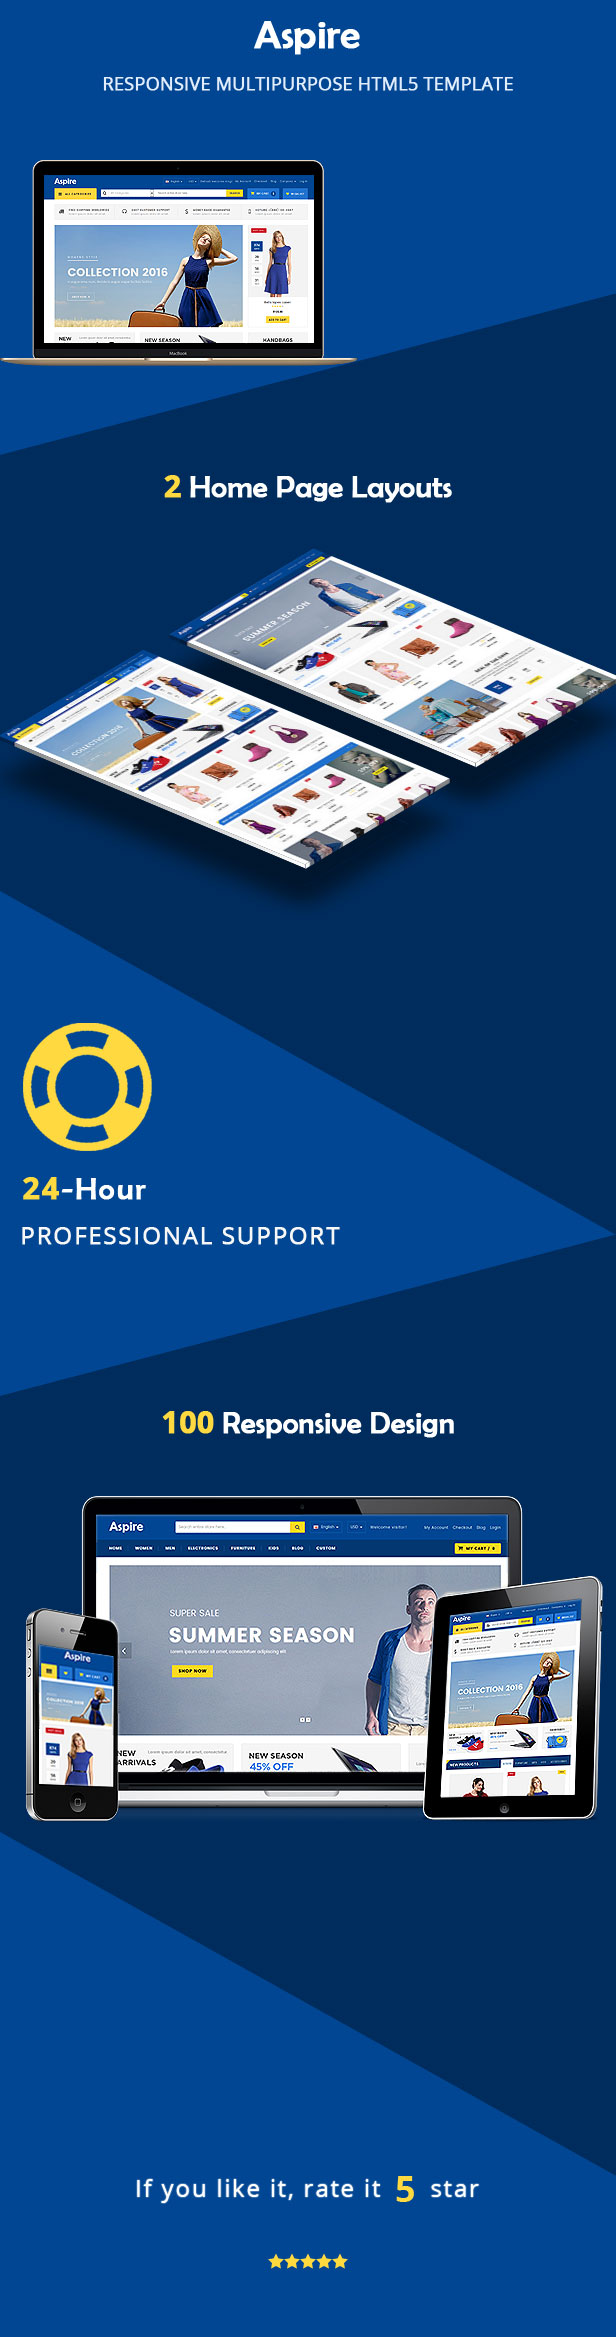 aspire responsive html template